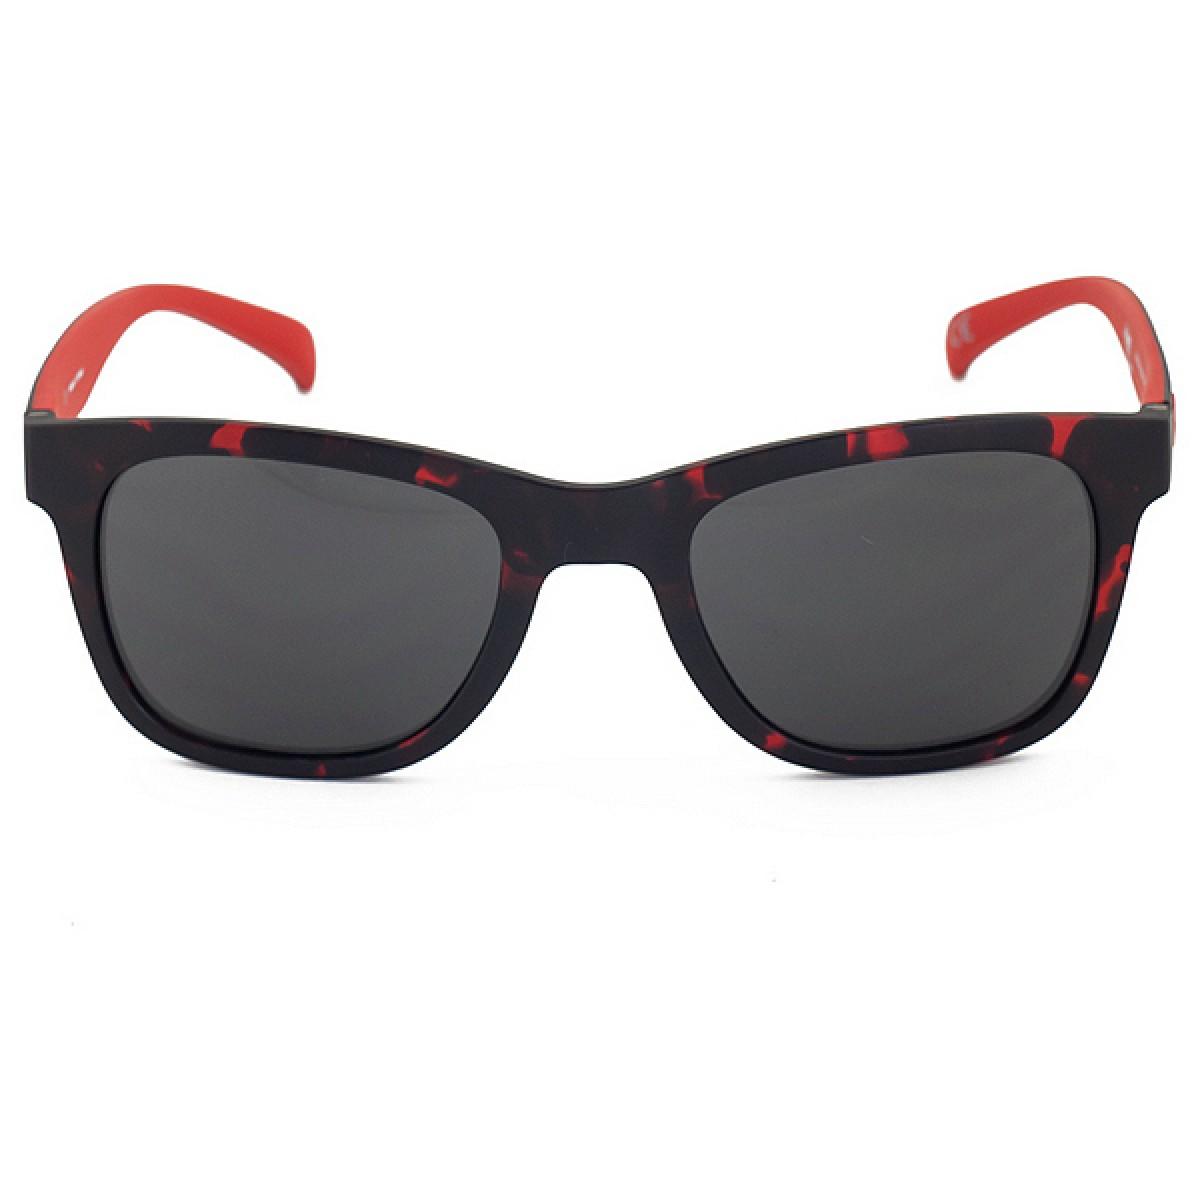 Solbriller Adidas AOR004 142 009